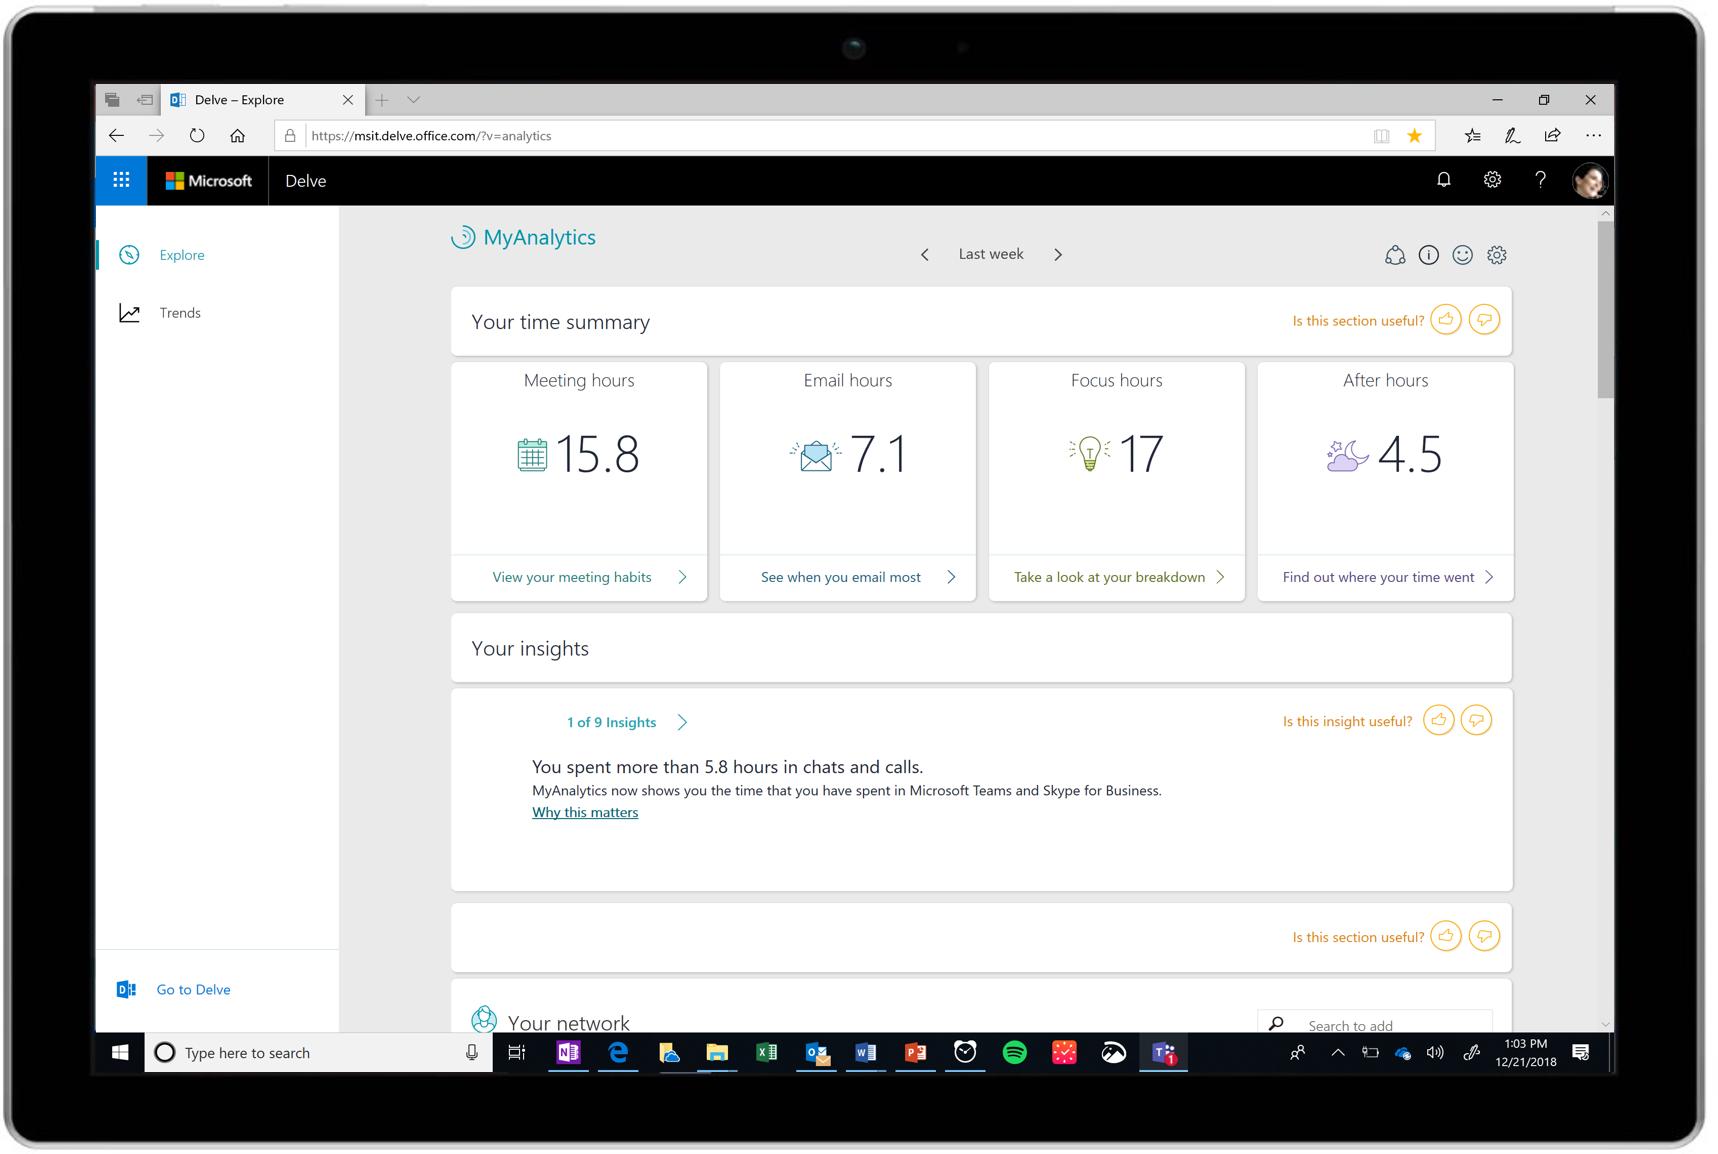 Office 365 MyAnalytics Dashboard